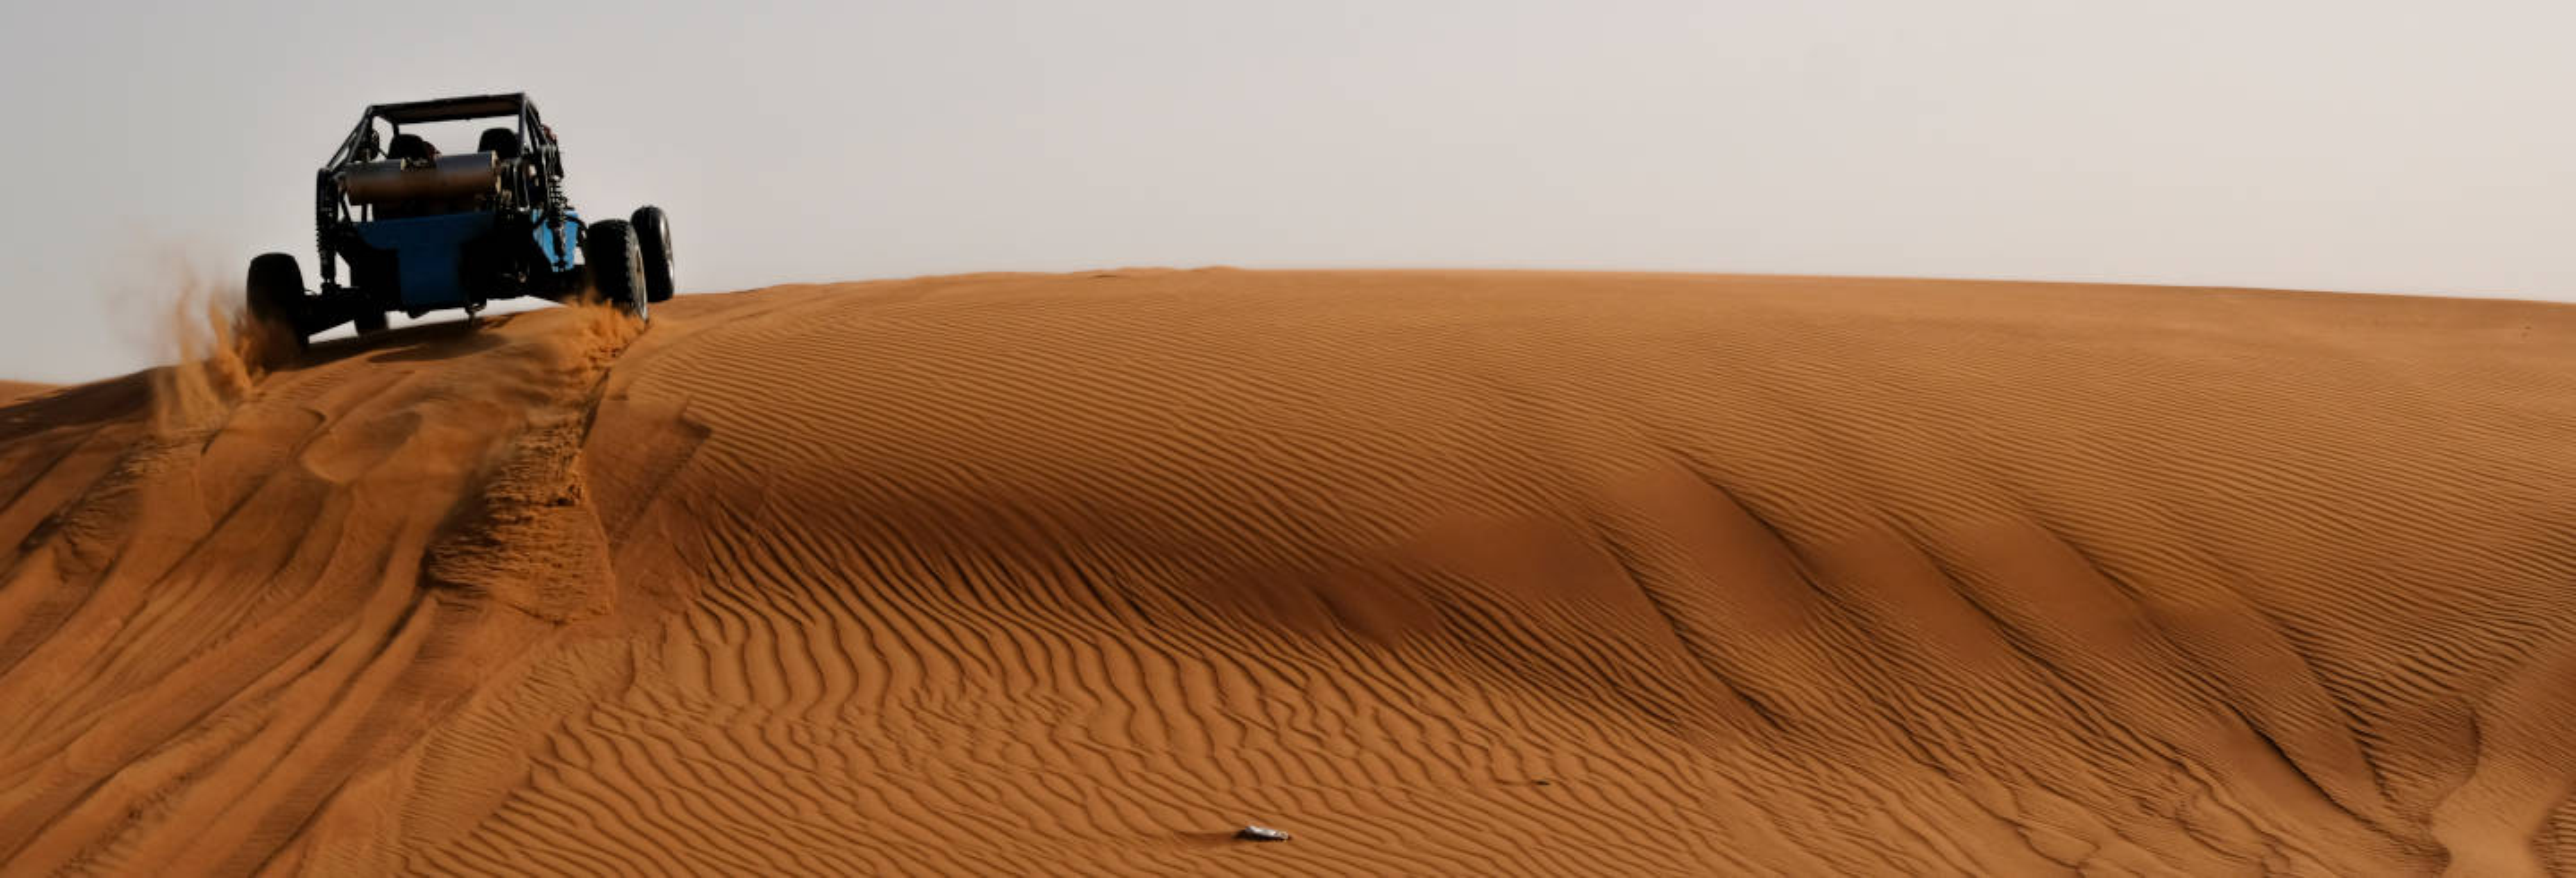 Tour in buggy e sandboarding nel deserto di Usaka